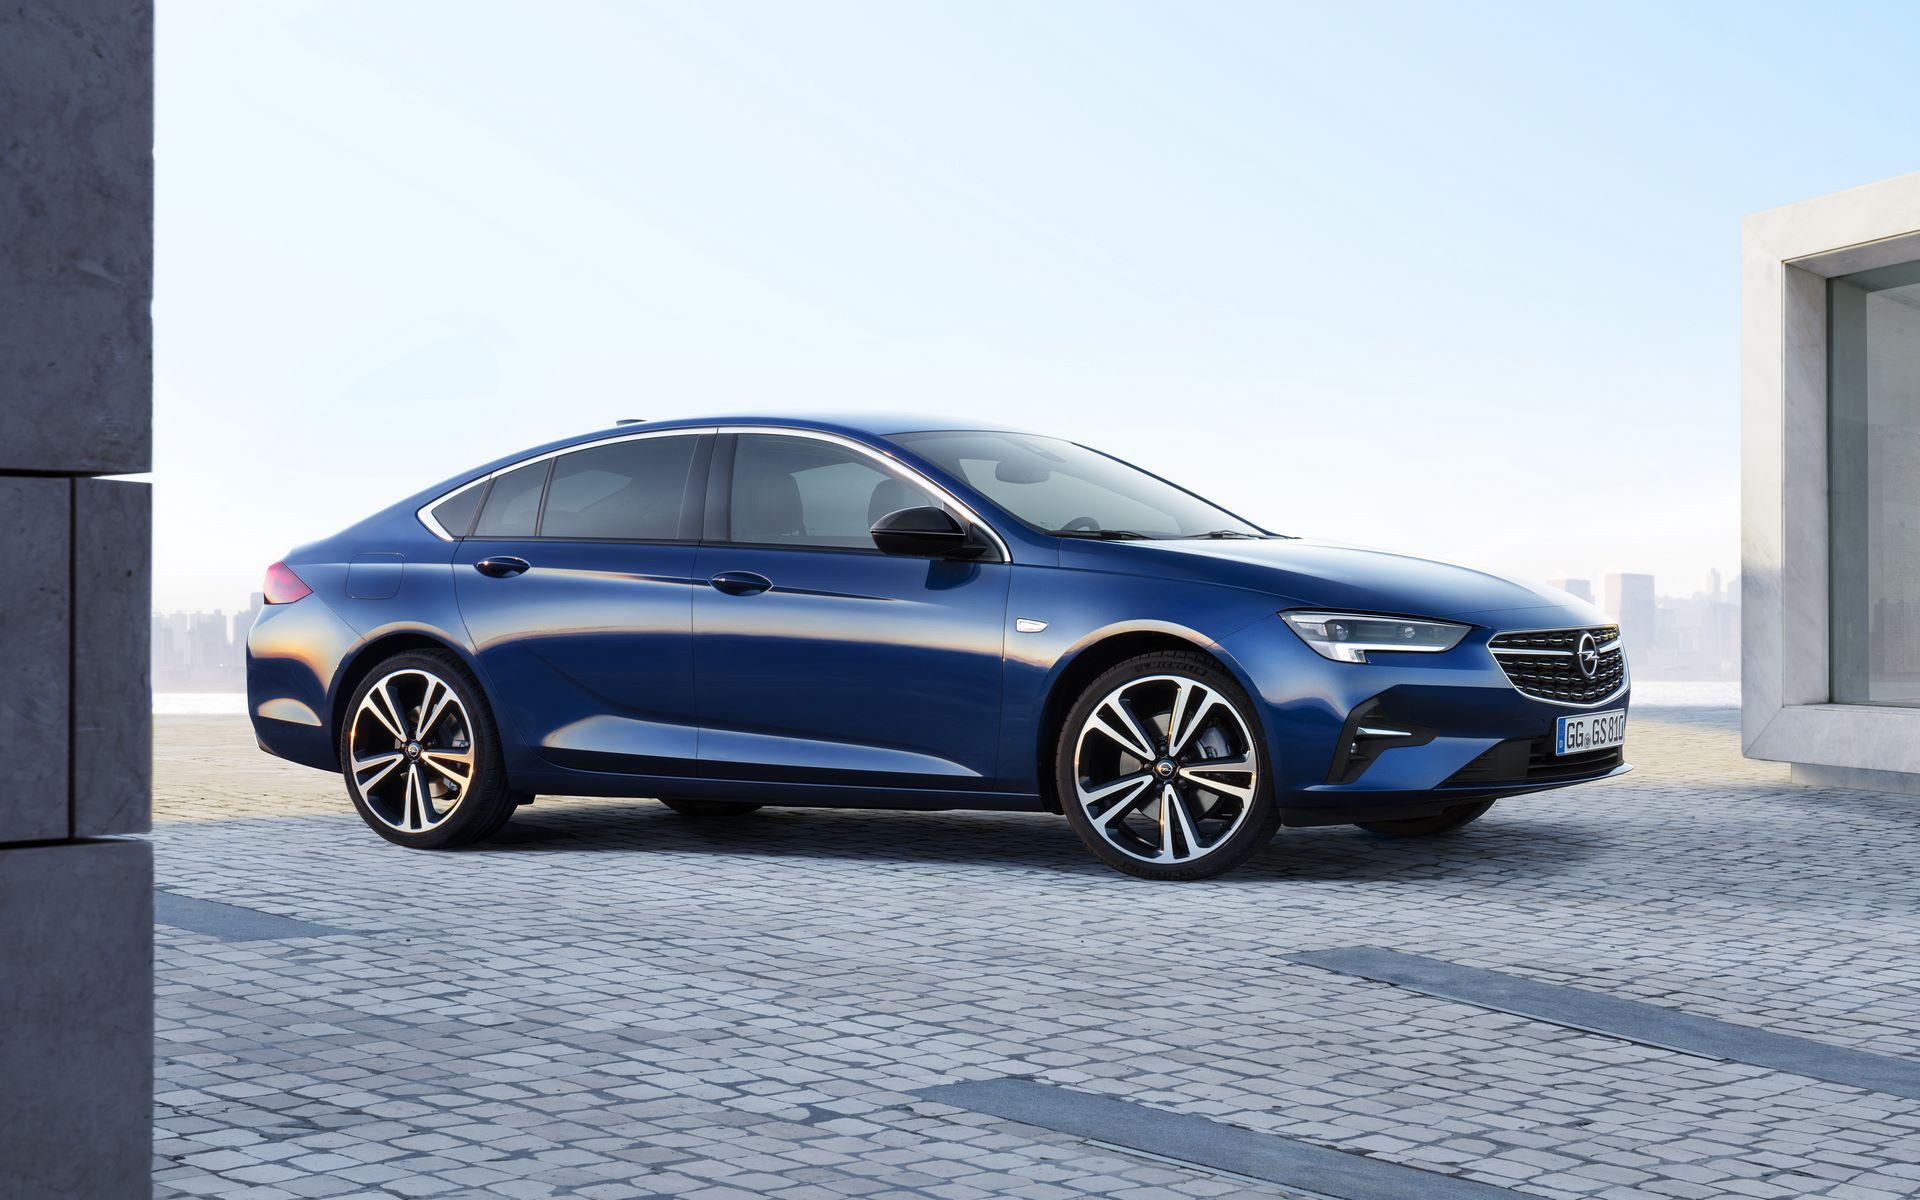 Opel-Insignia-facelift-2020-6